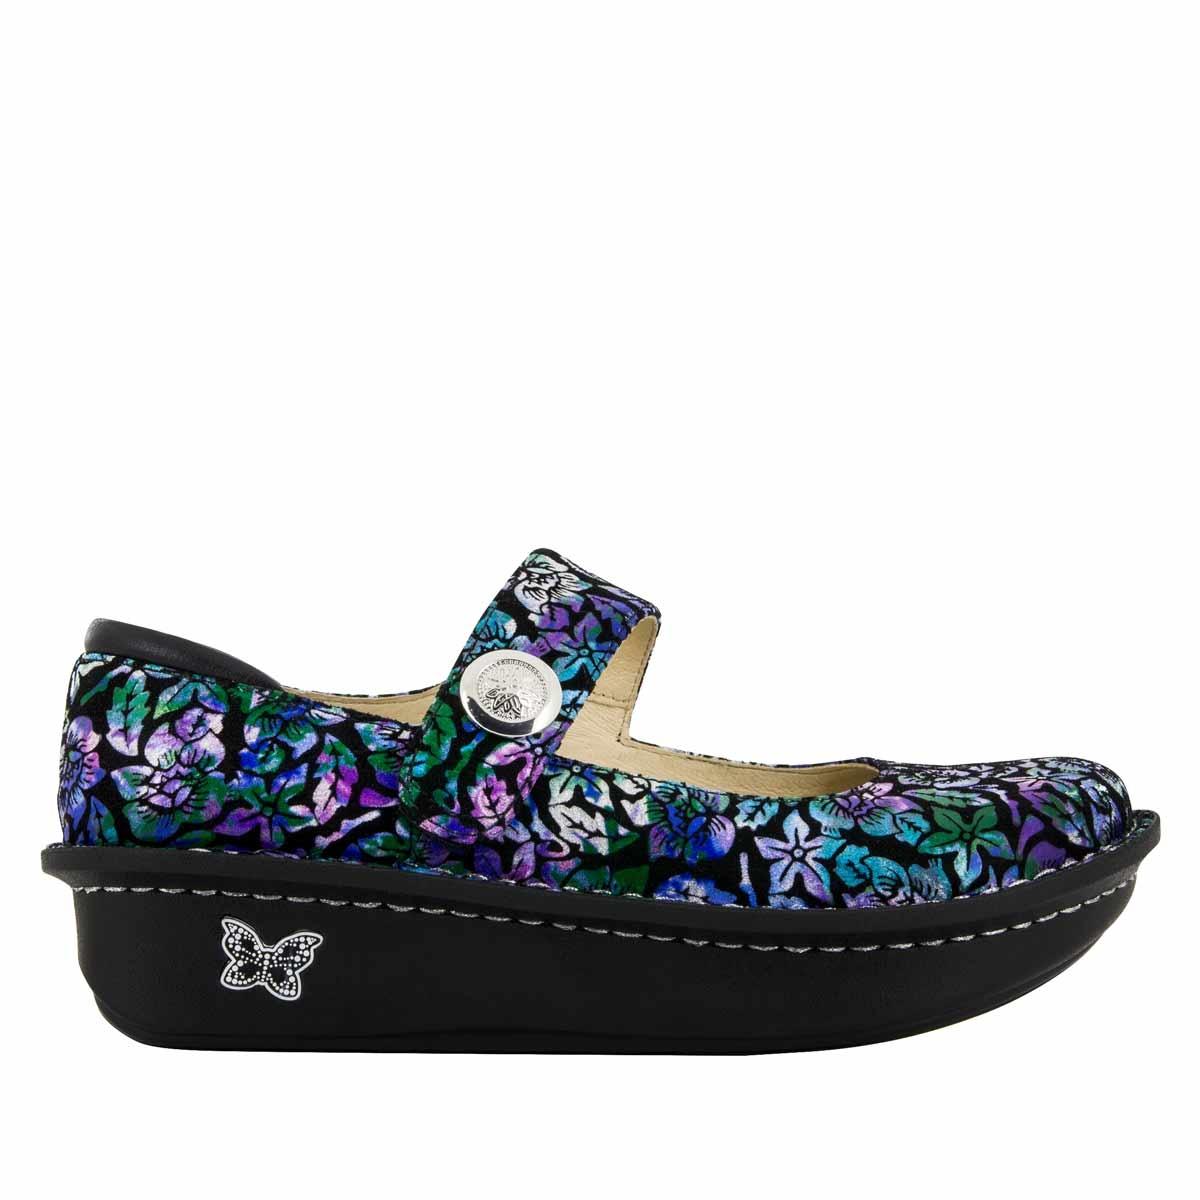 Alegria Shoes Paloma Hibiscus Amp Co Mary Jane